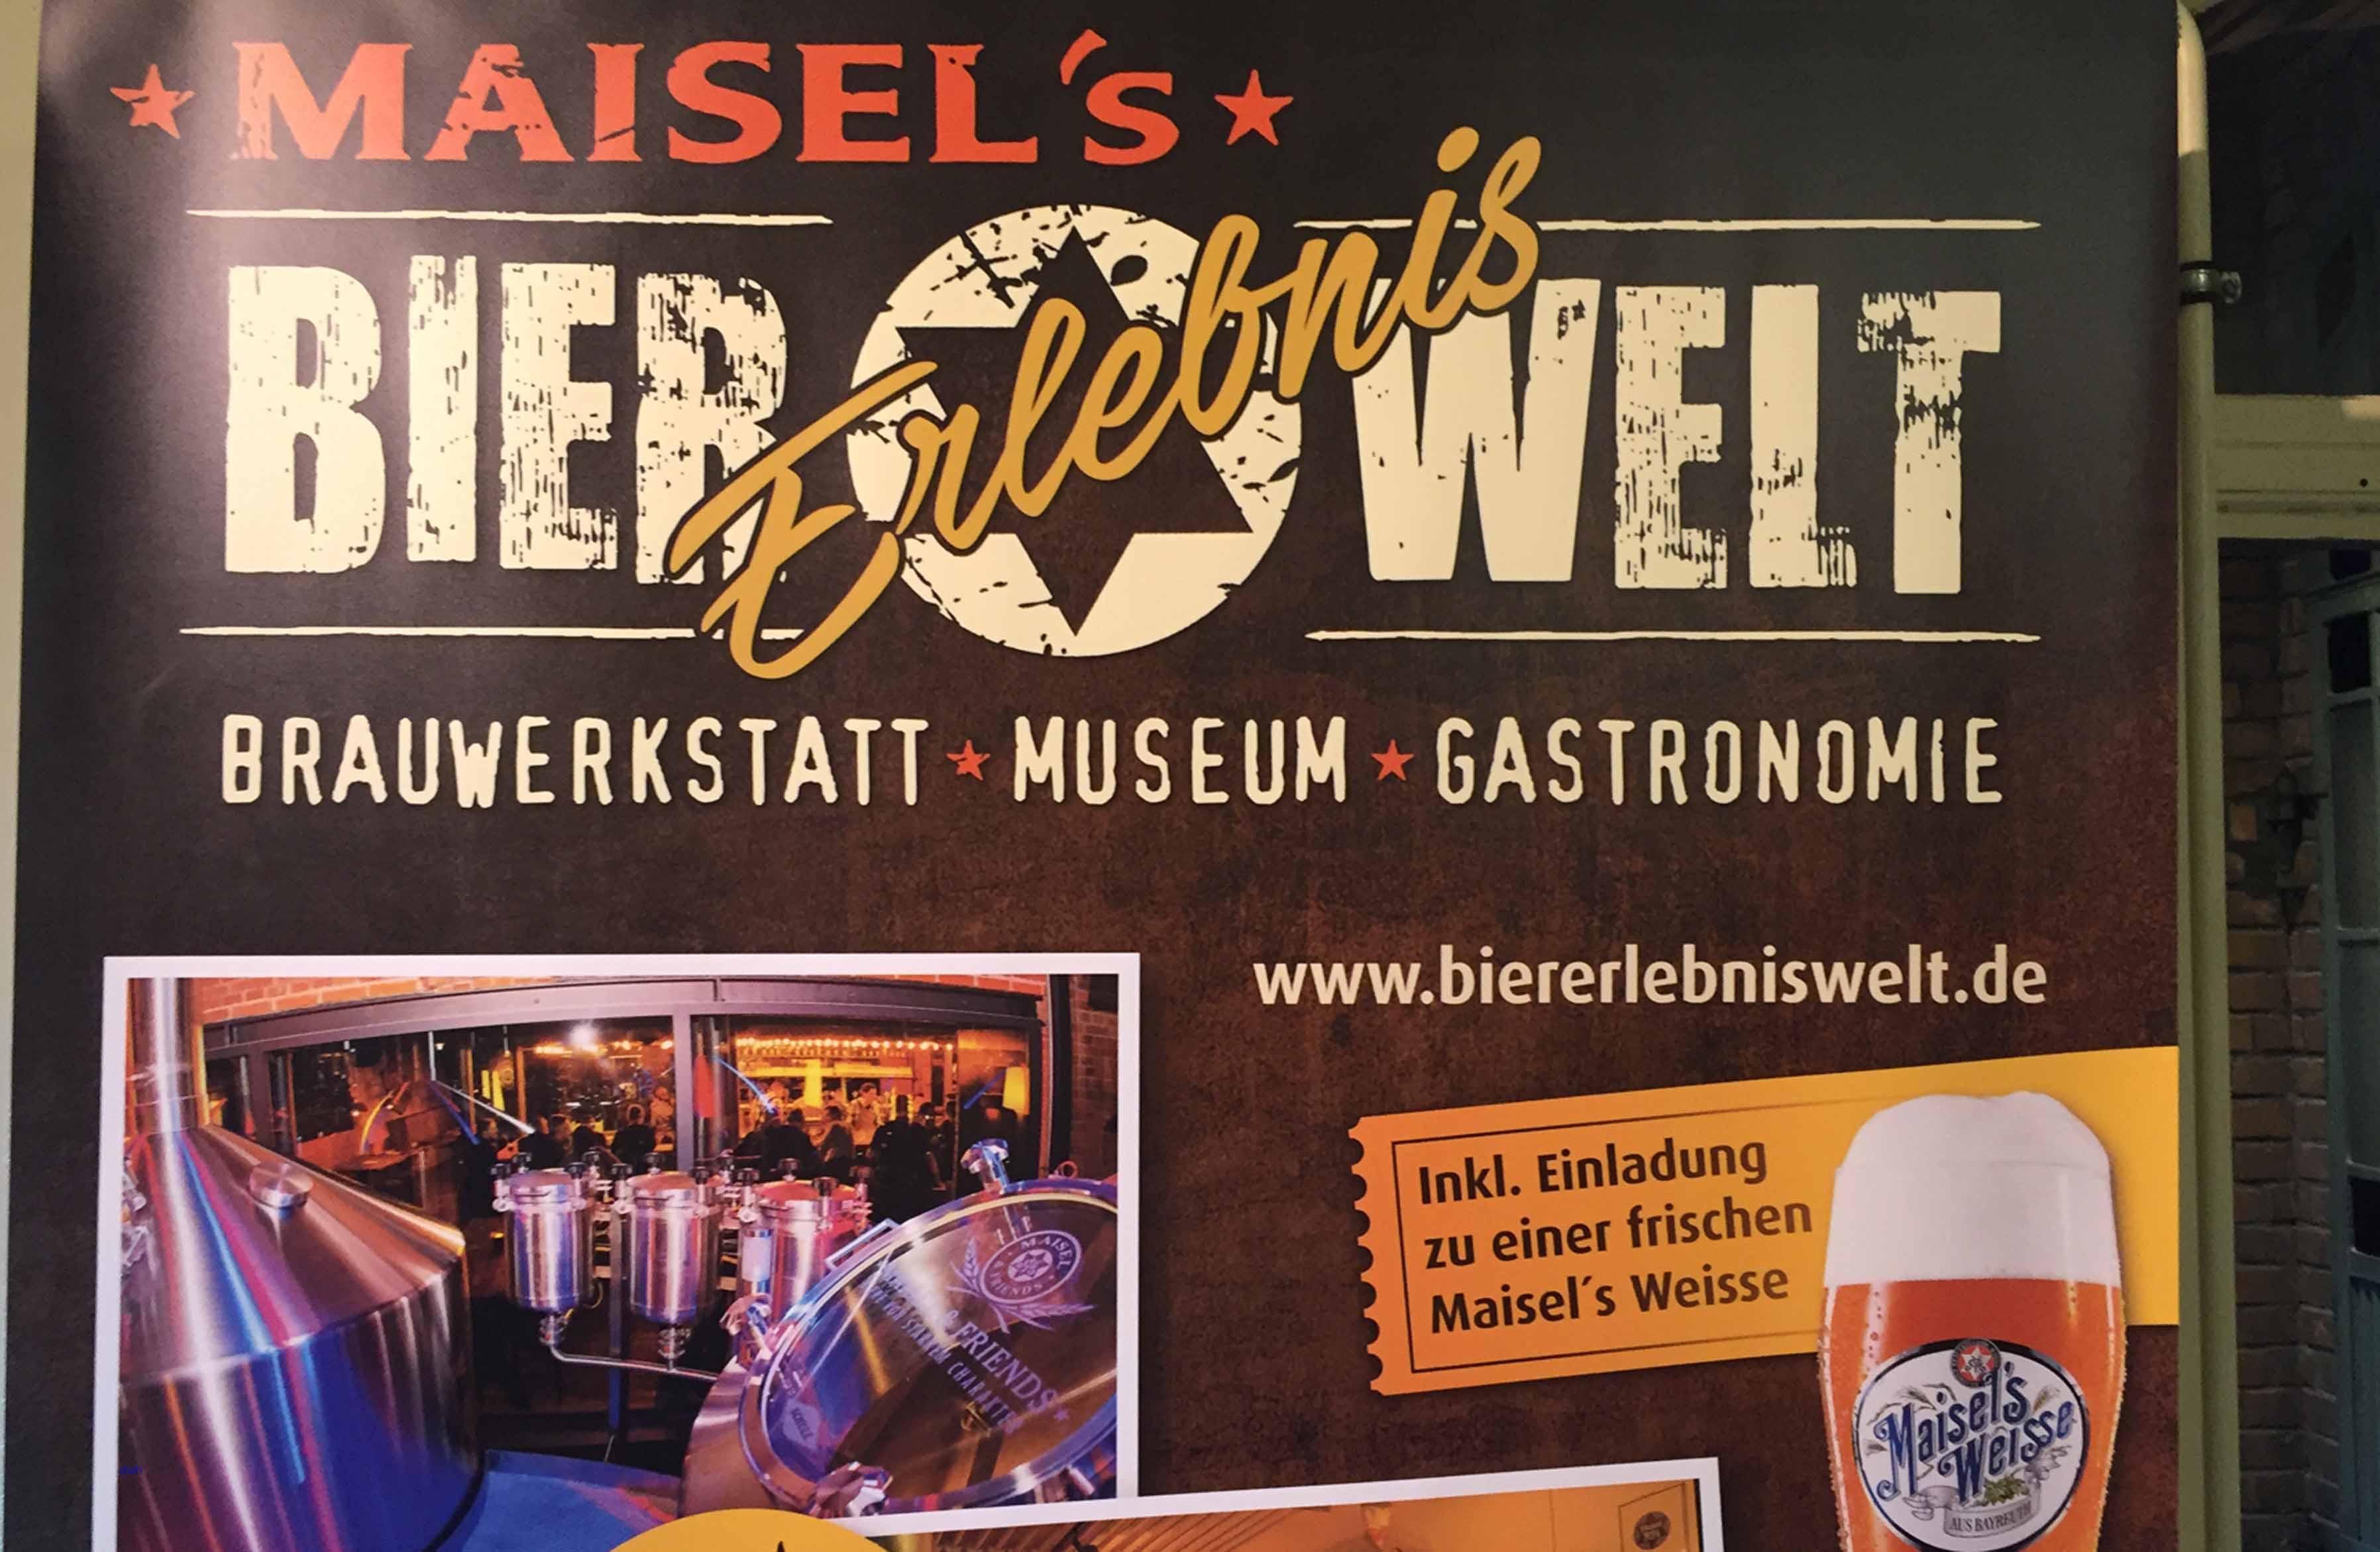 Maisels Bier Erlebniswelt in Bayreuth